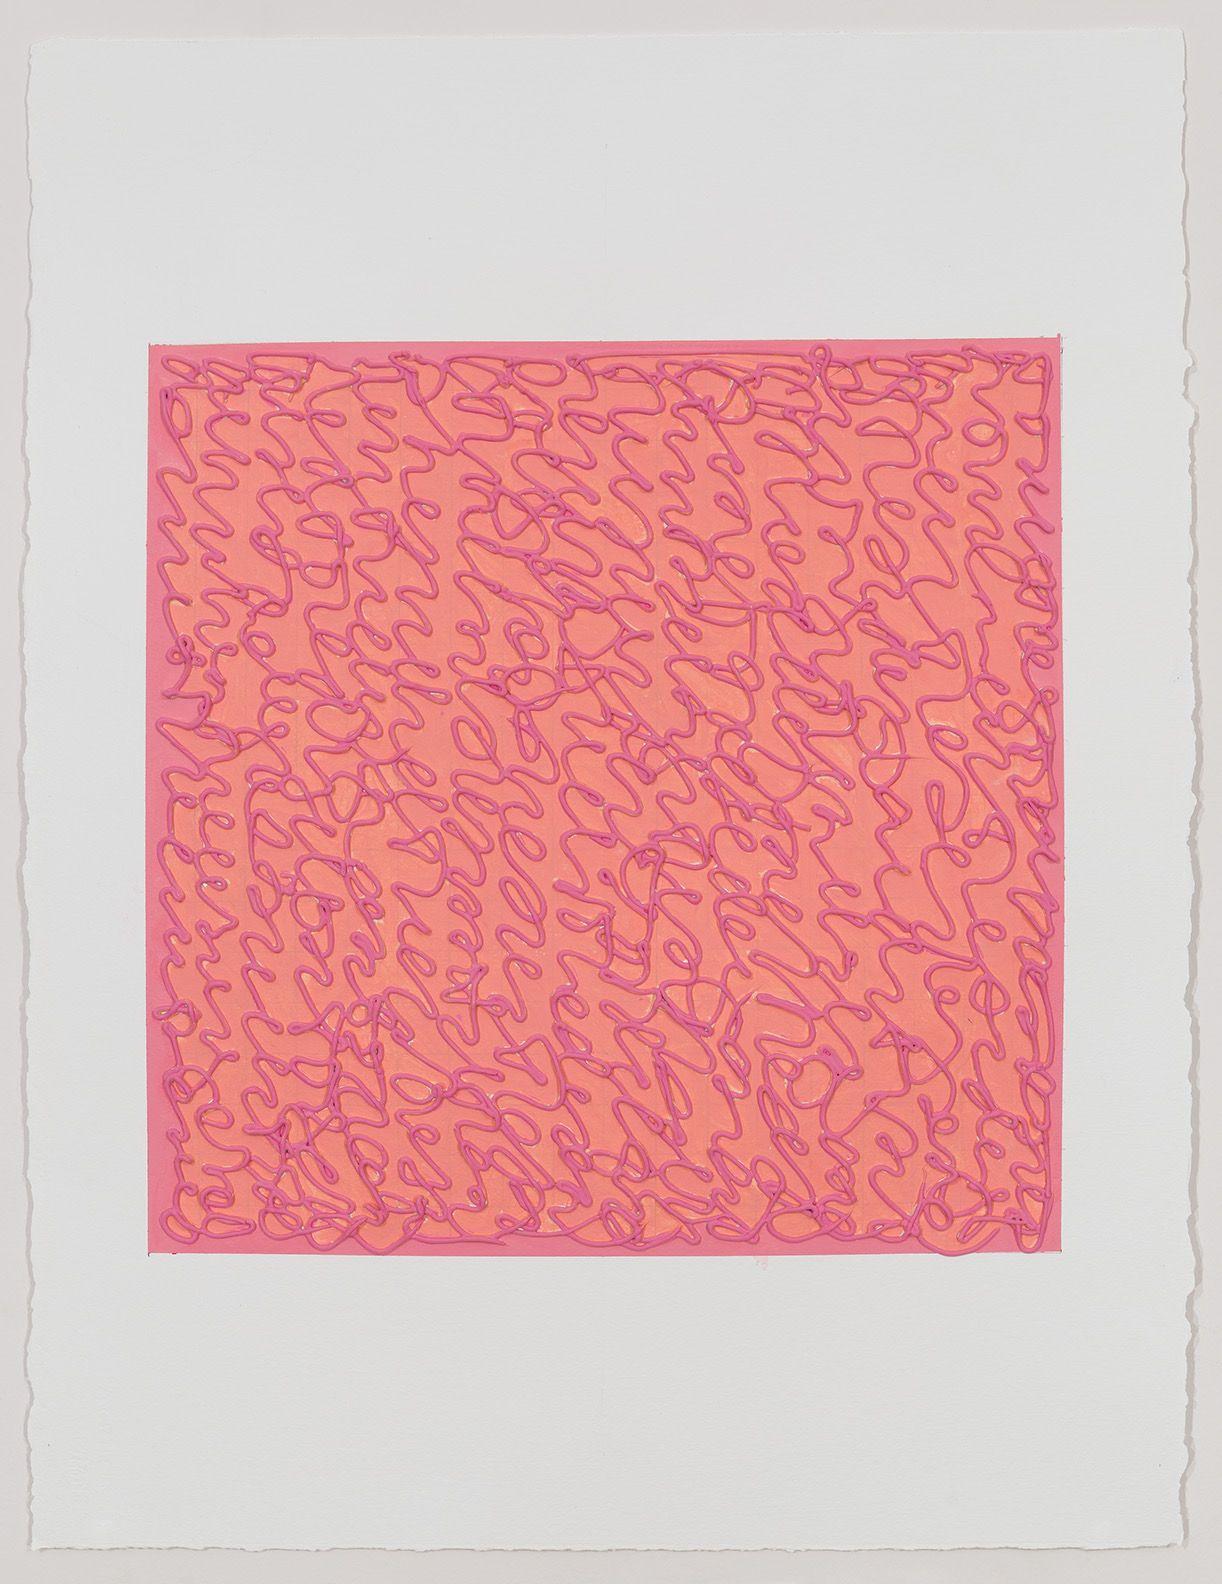 Louise P. Sloane, Pink Kiss, 2019